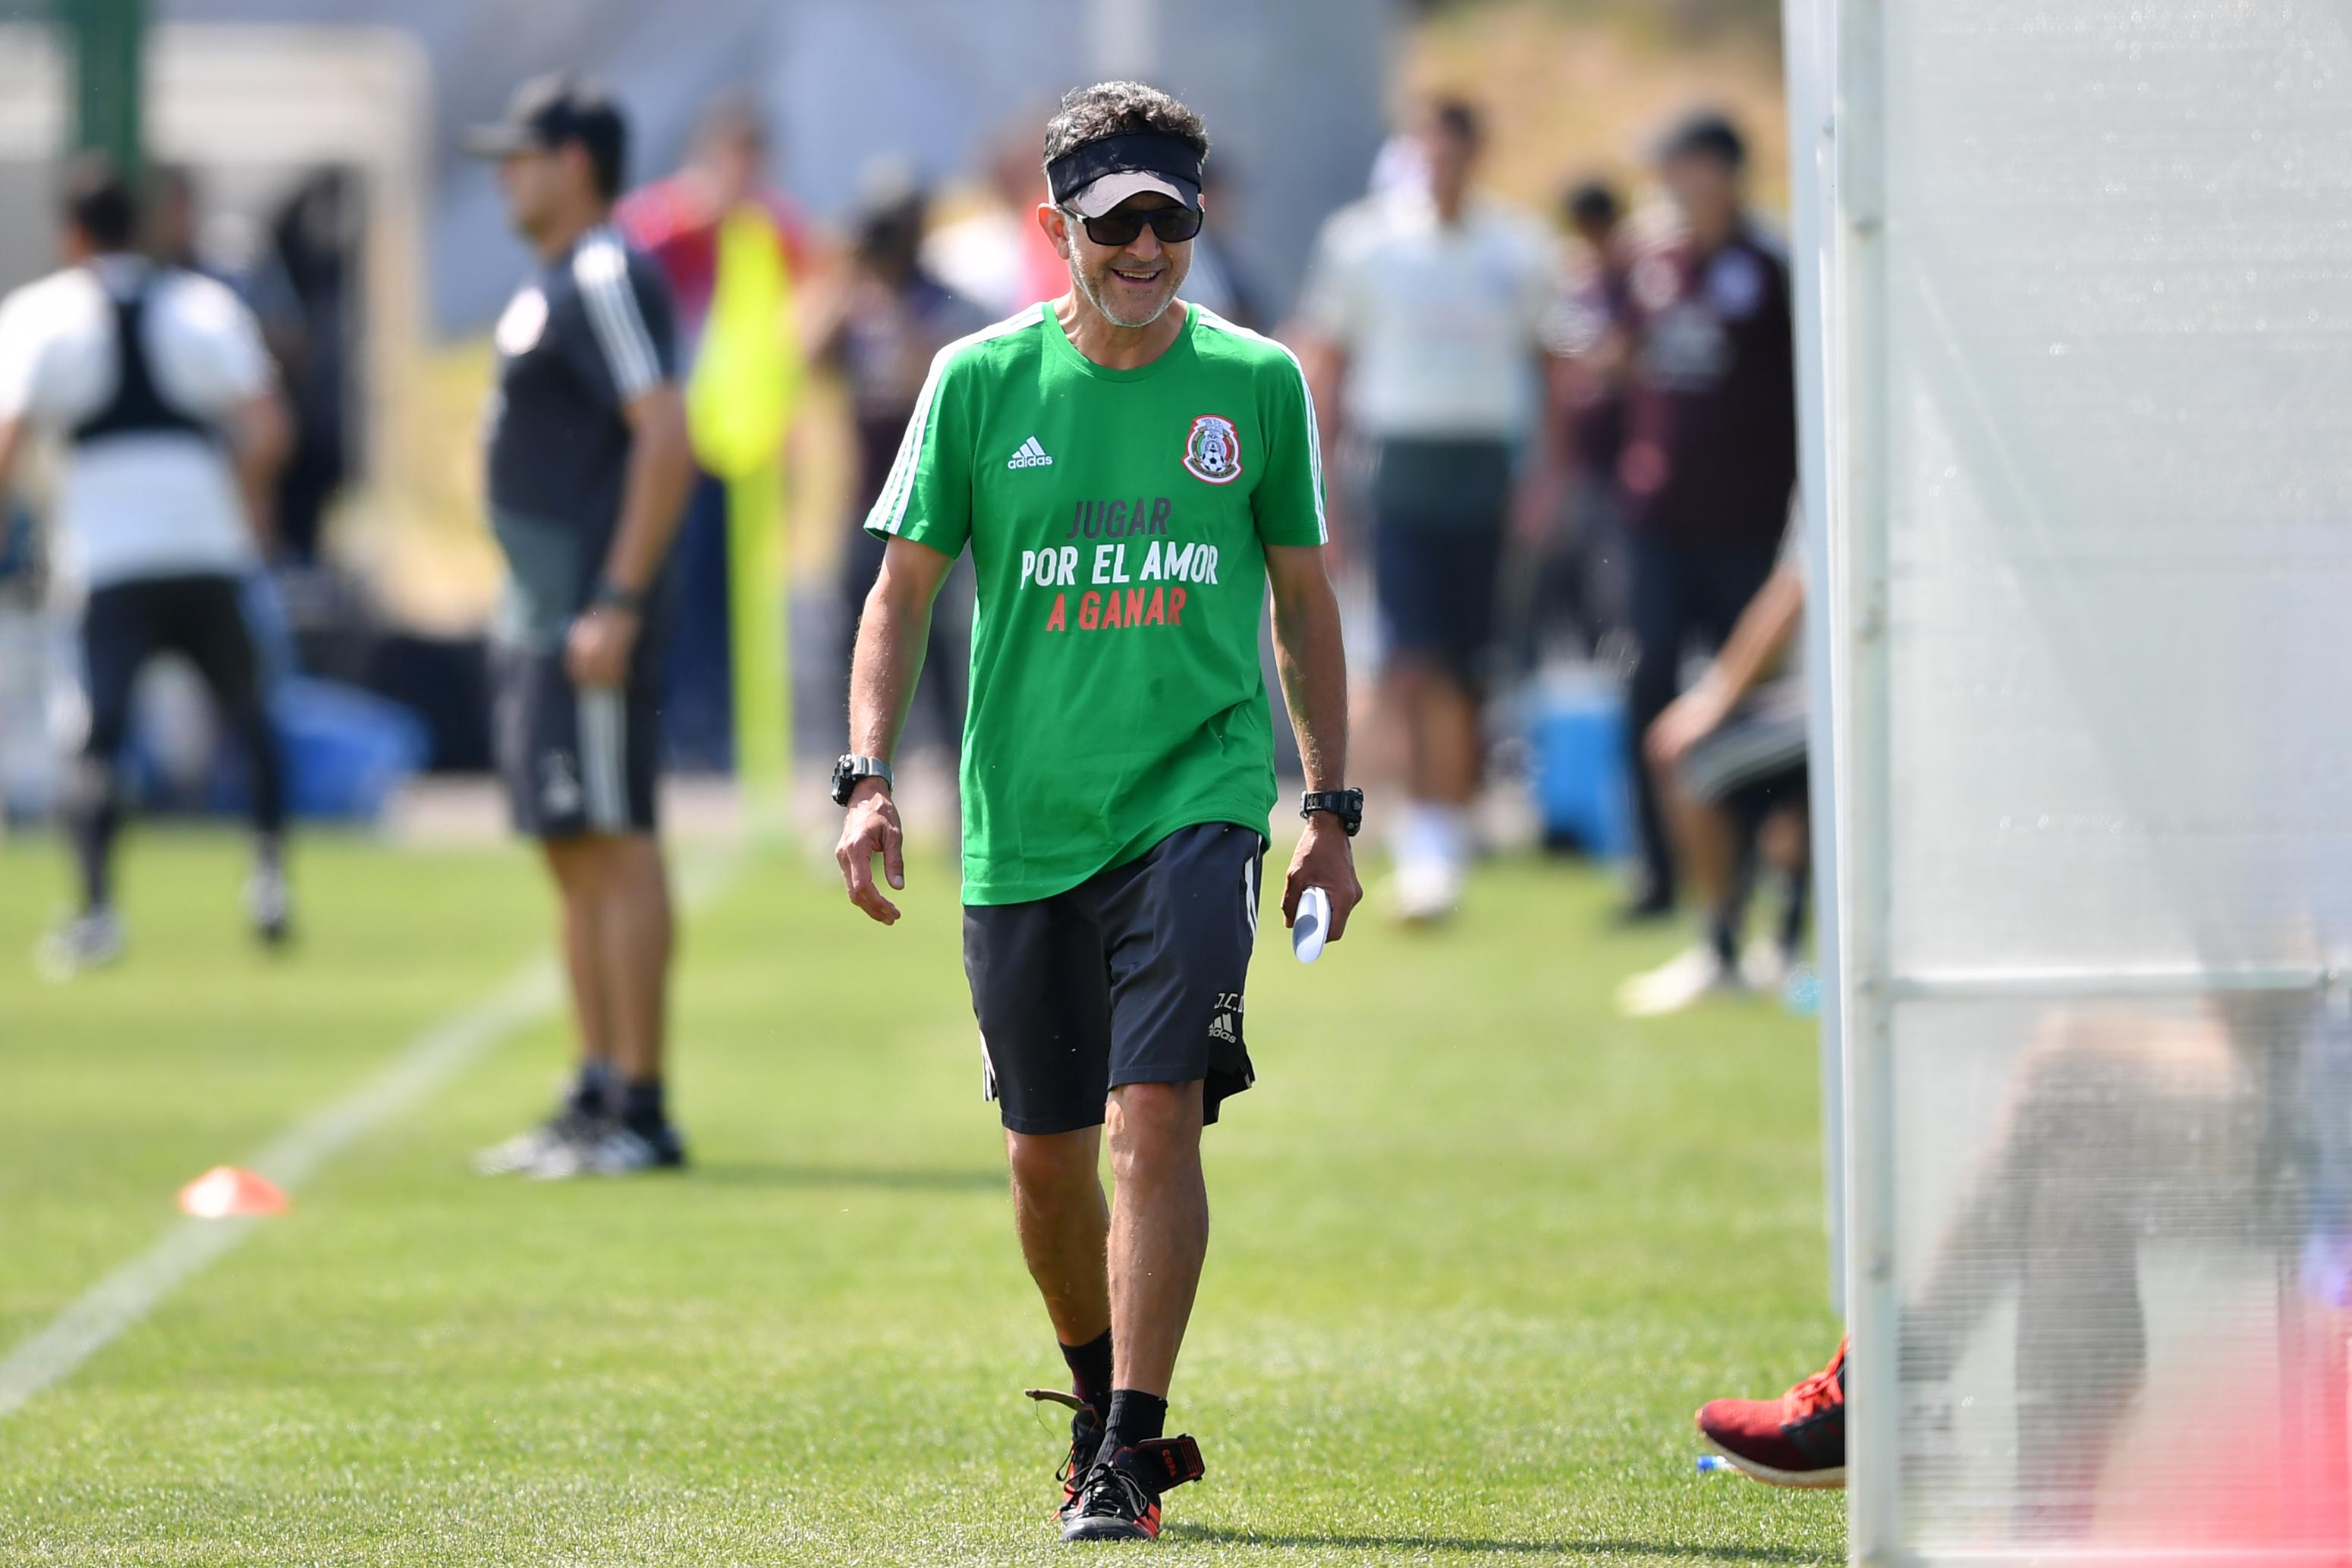 Juan Carlos Osorio, Aston Villa, Inglaterra, Paraguay